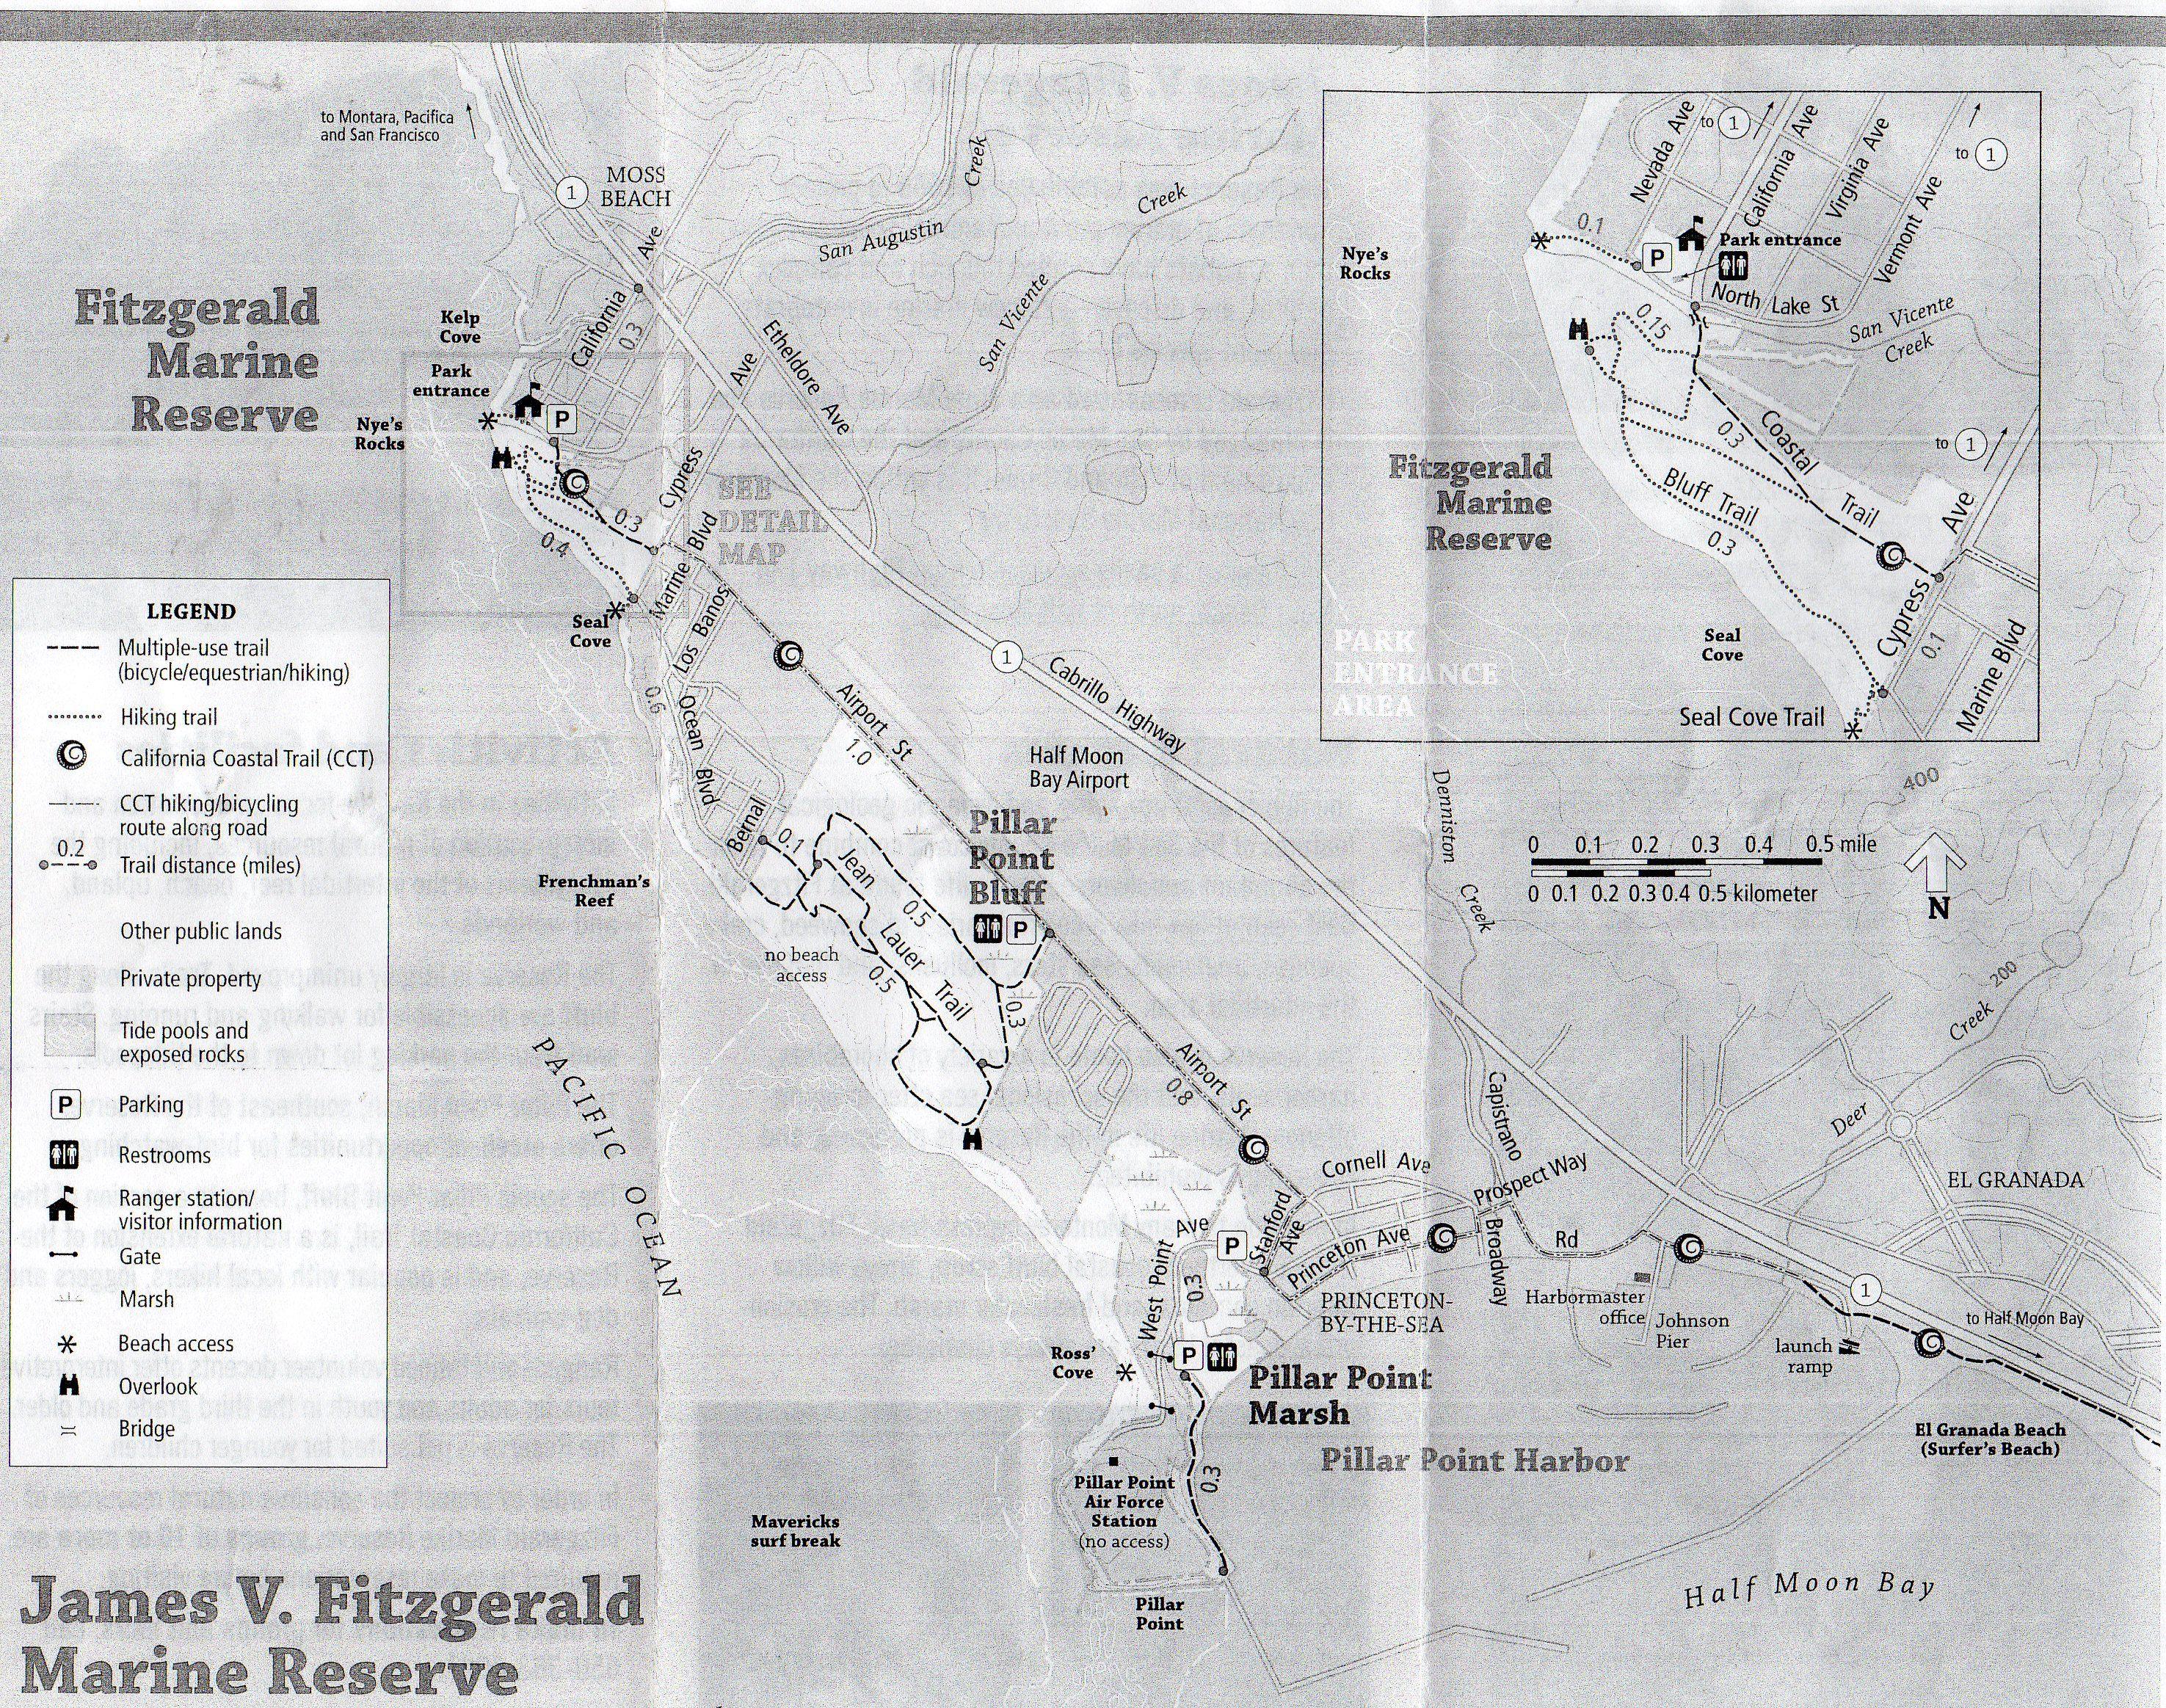 Fitzgerald Marine Reserve Map San Mateo County Marine Reserves California Coastline